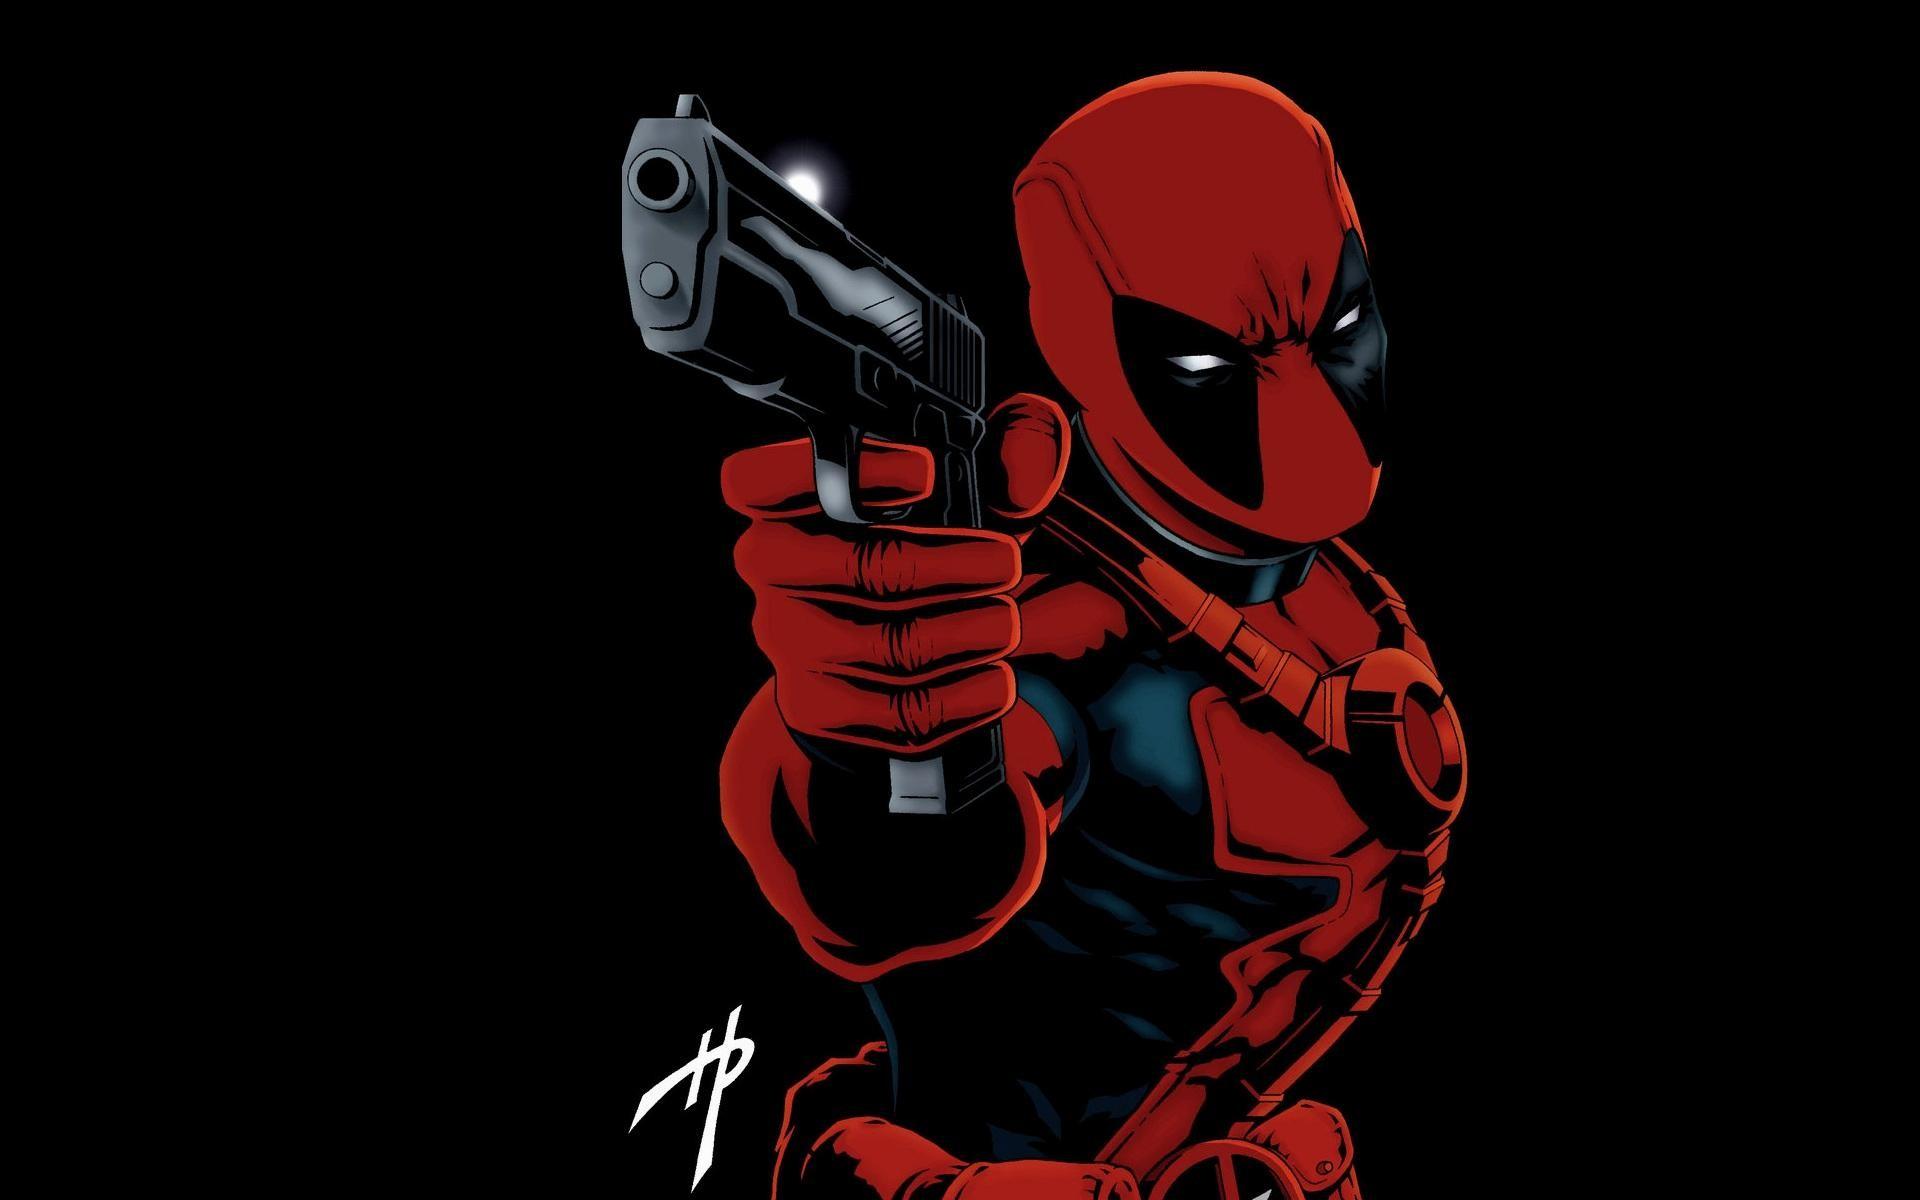 Deadpool Wallpaper 1080p 73 Images